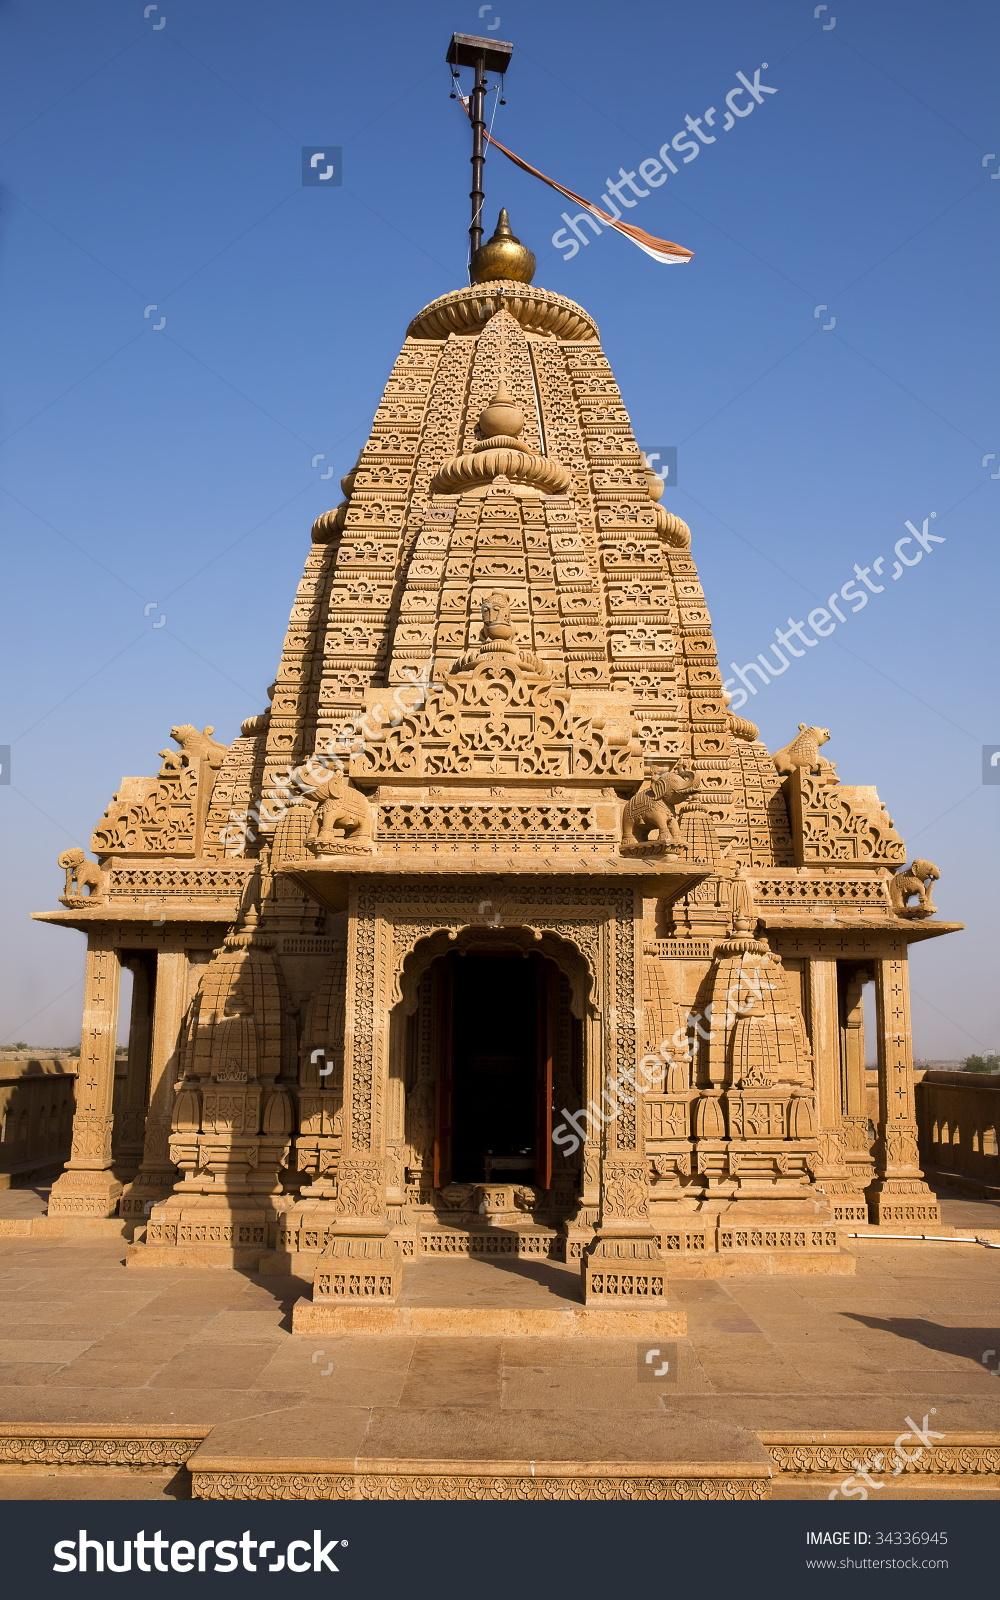 Jain Temple Clipart.